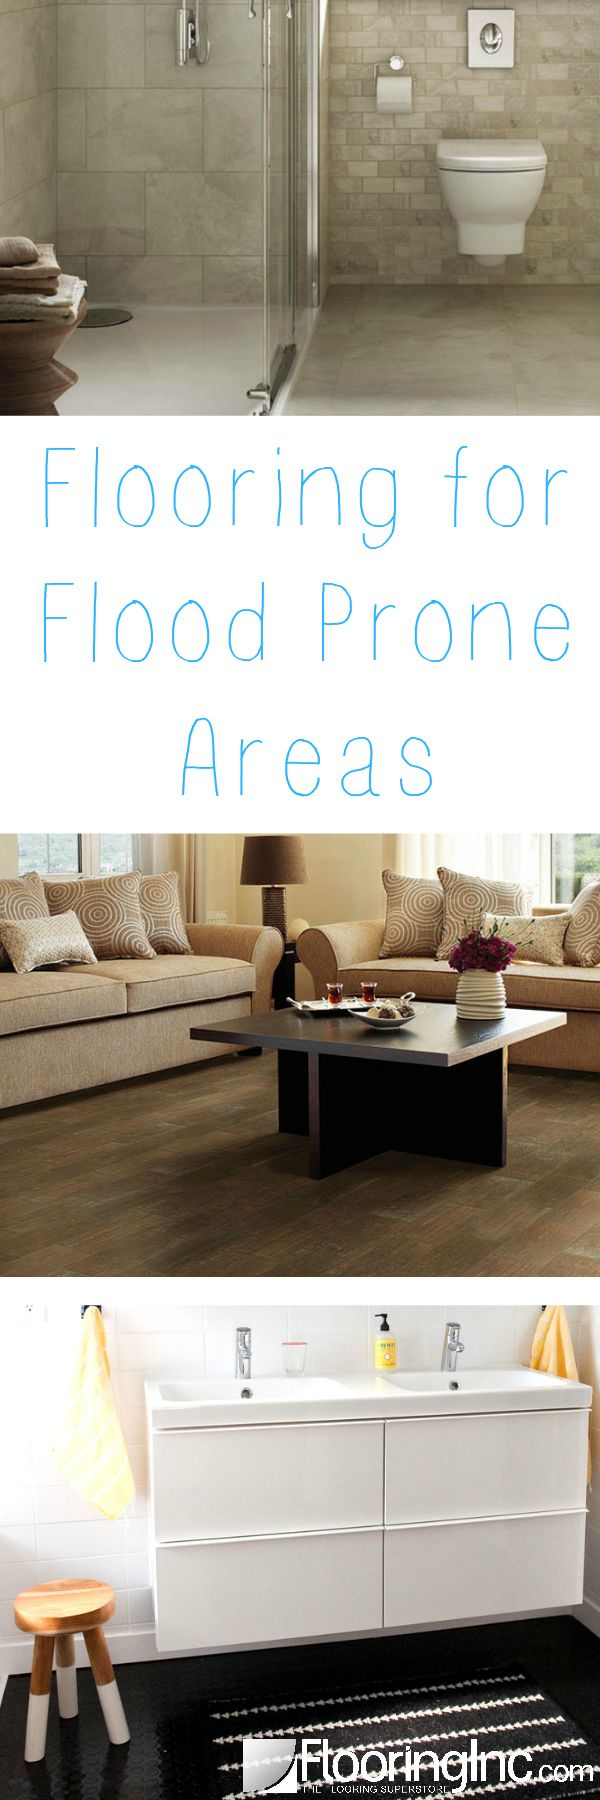 Flooring for FloodProne Areas Home gym flooring